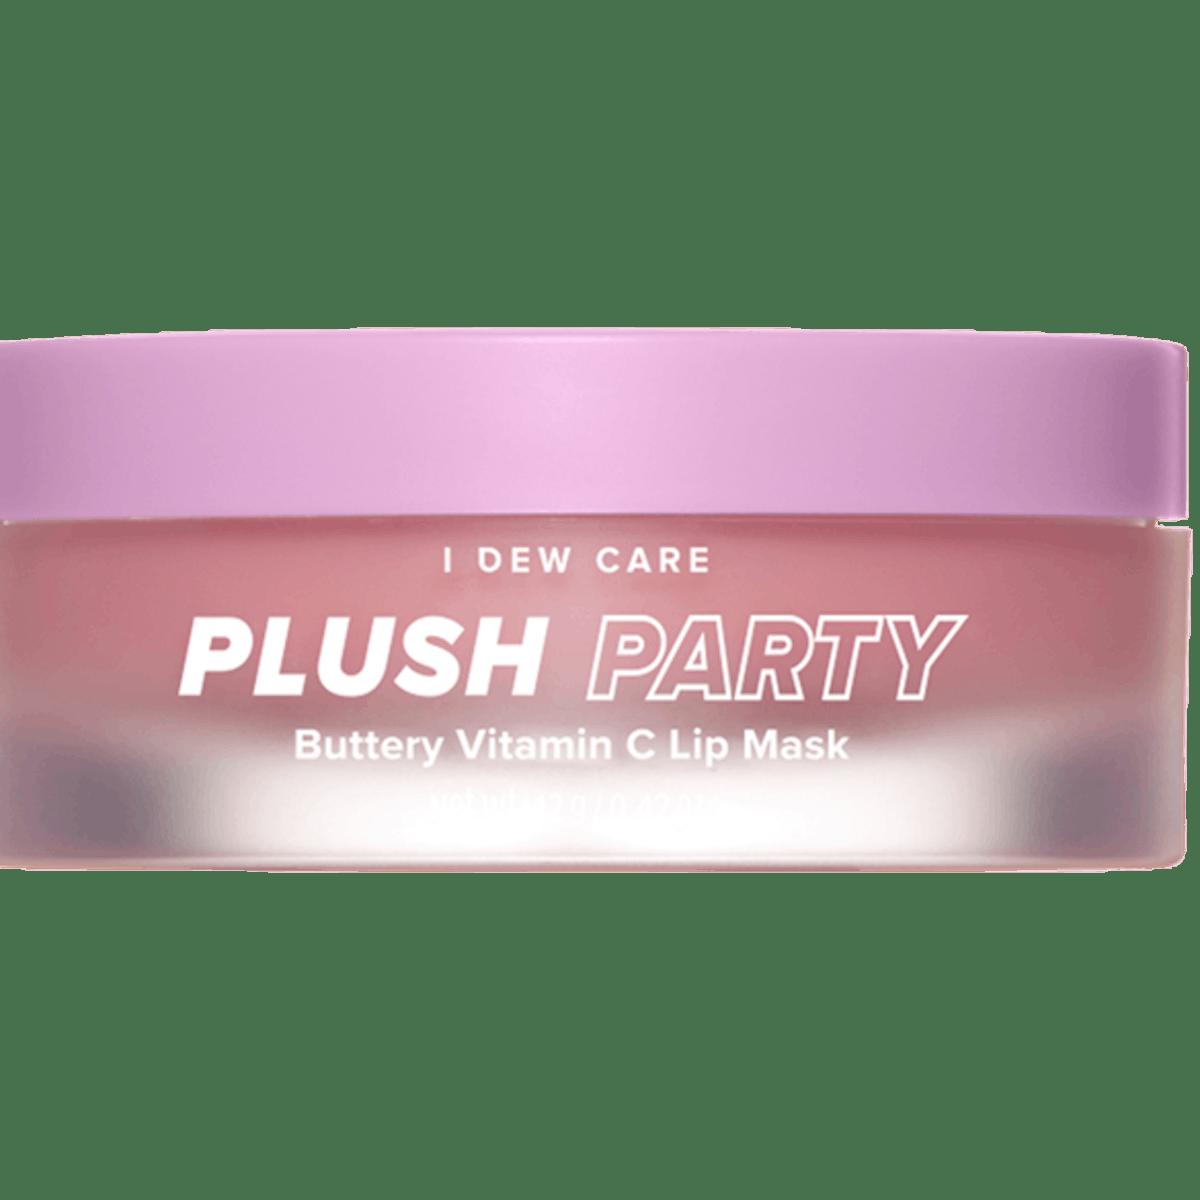 Plush Party